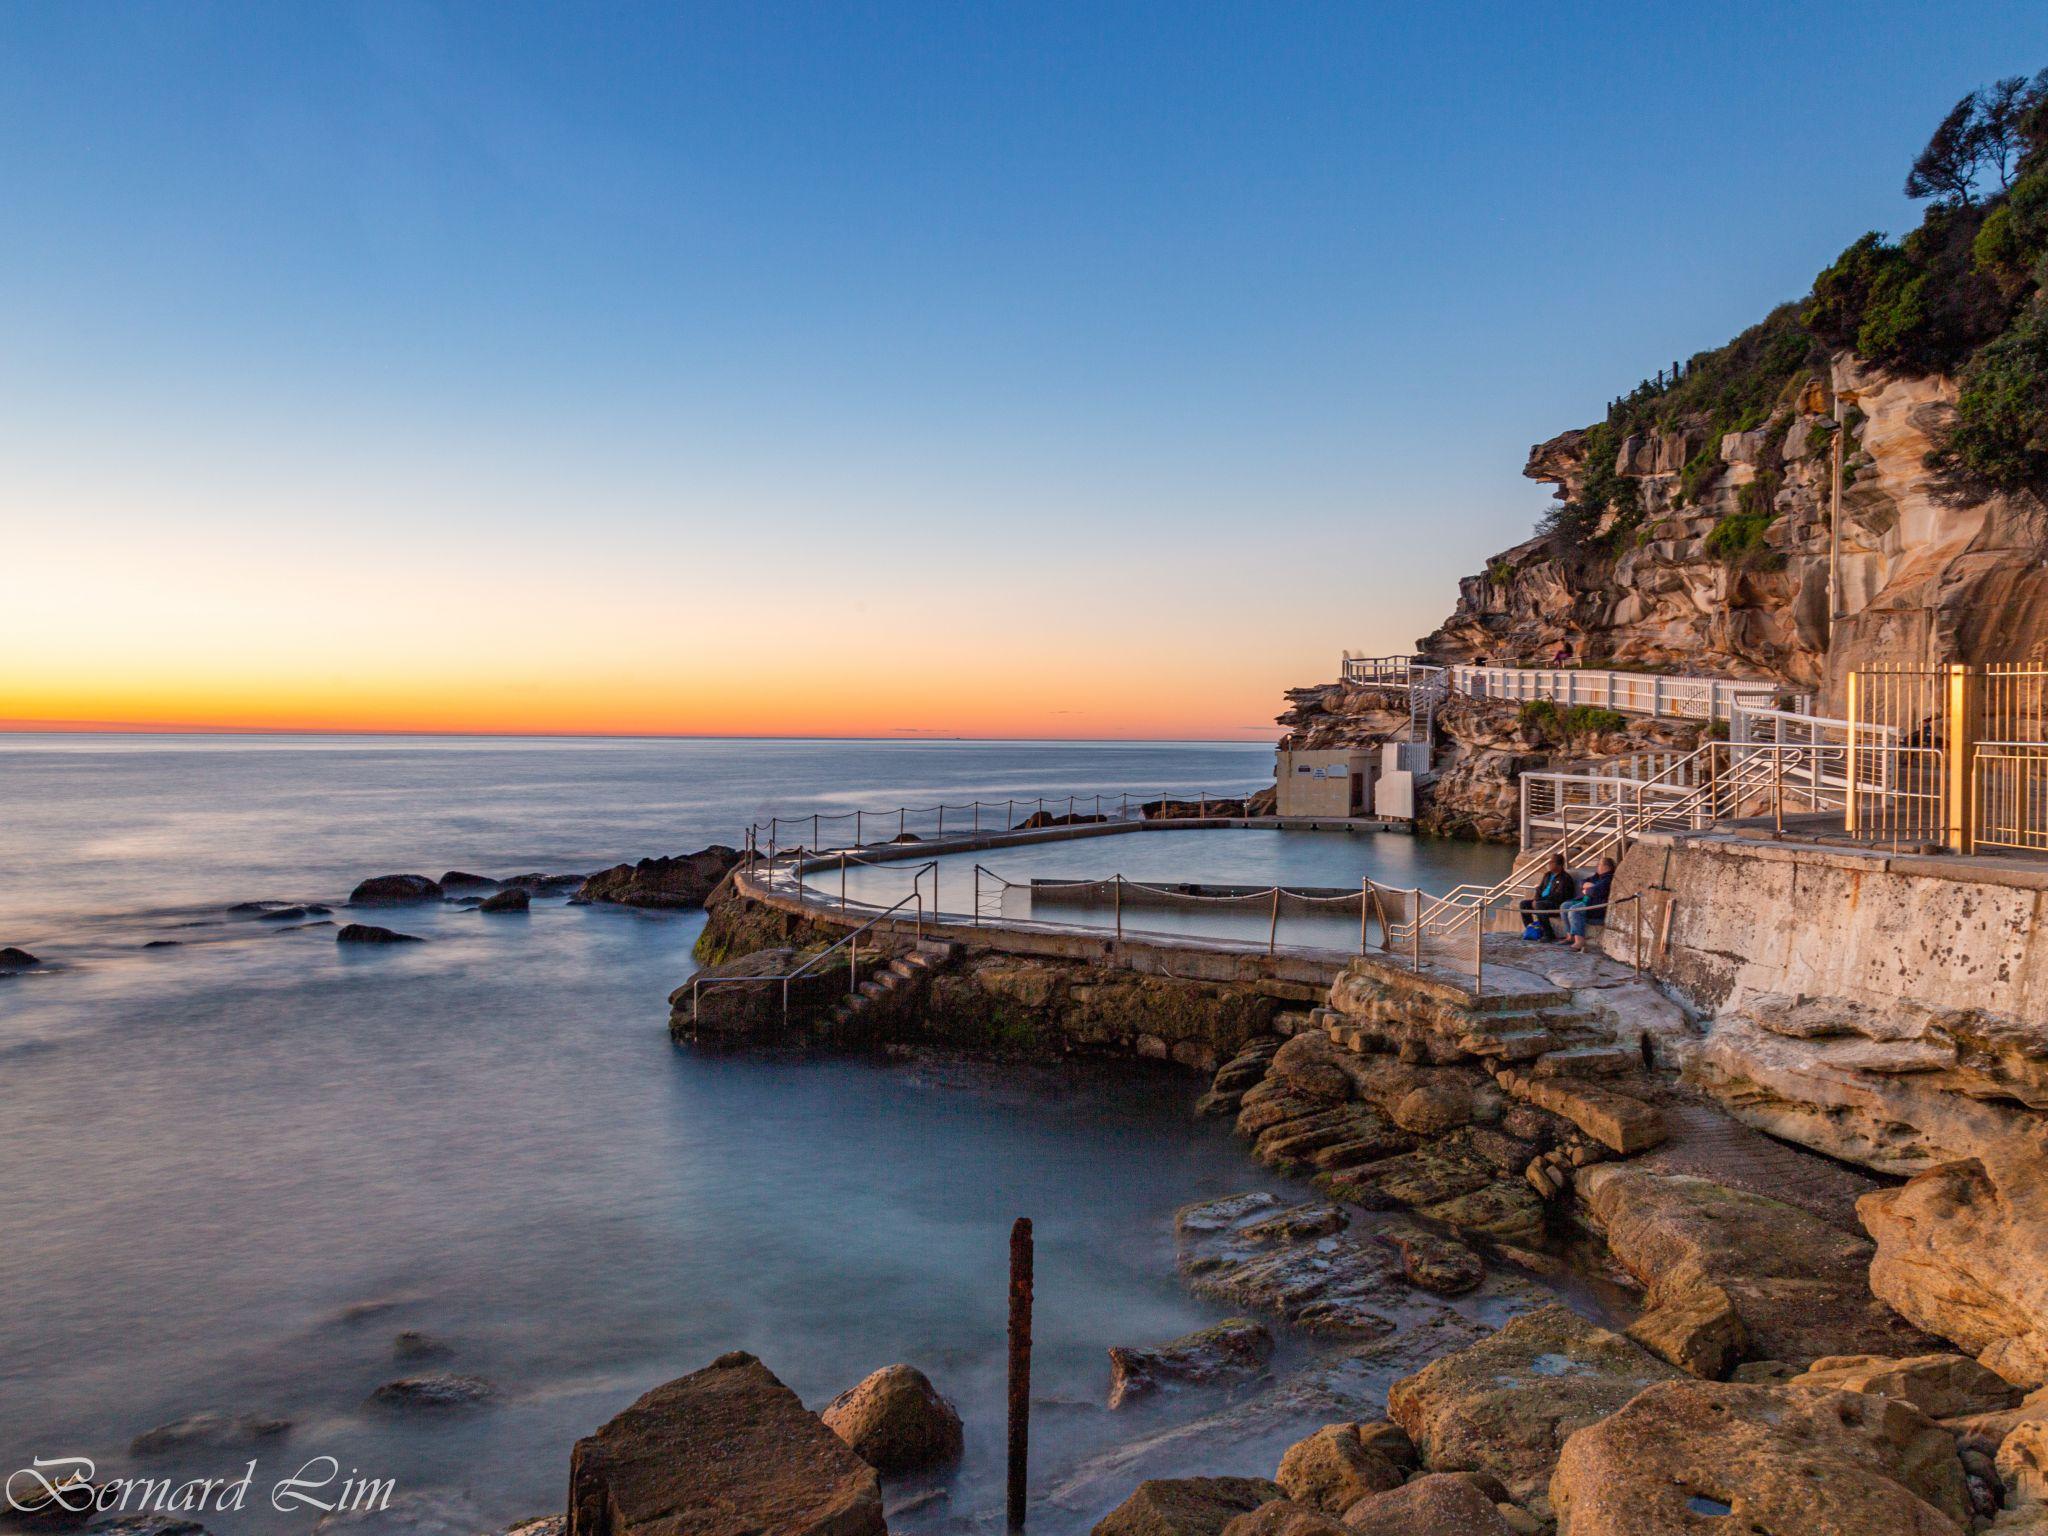 sunrise over the coastal pool, Australia